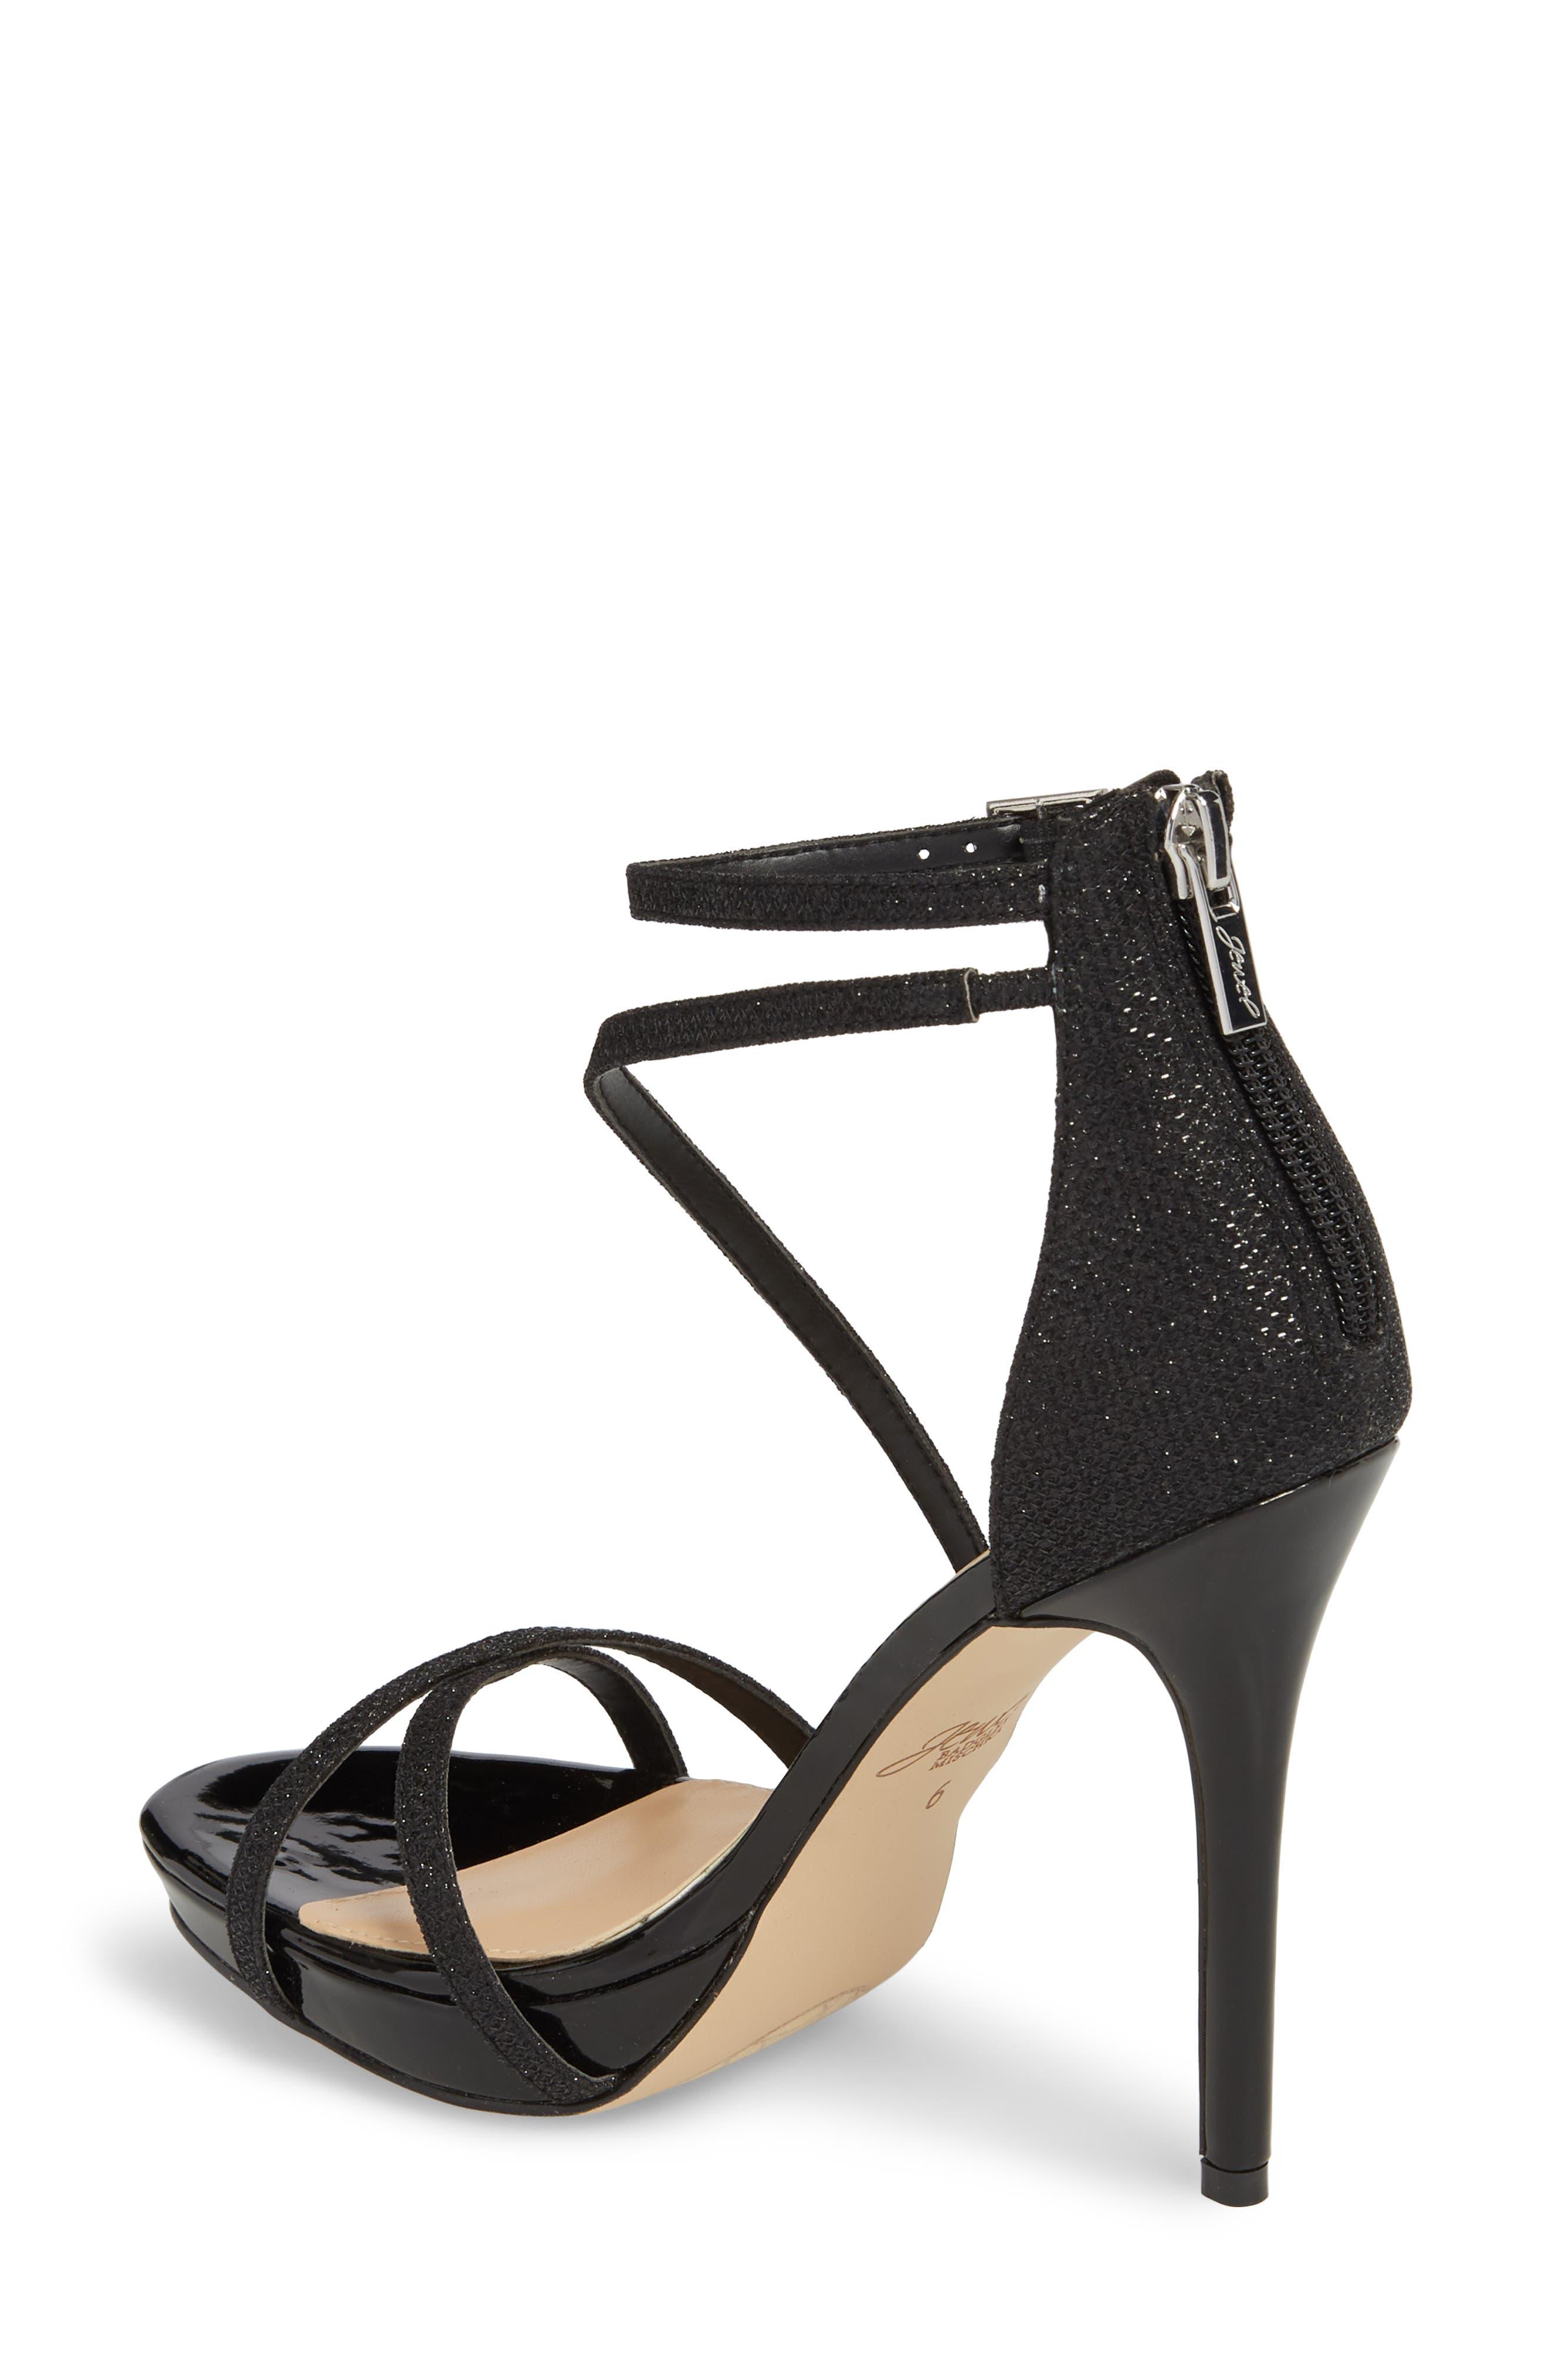 JEWEL BADGLEY MISCHKA, Galen Strappy Platform Sandal, Alternate thumbnail 2, color, BLACK GLITTER FABRIC